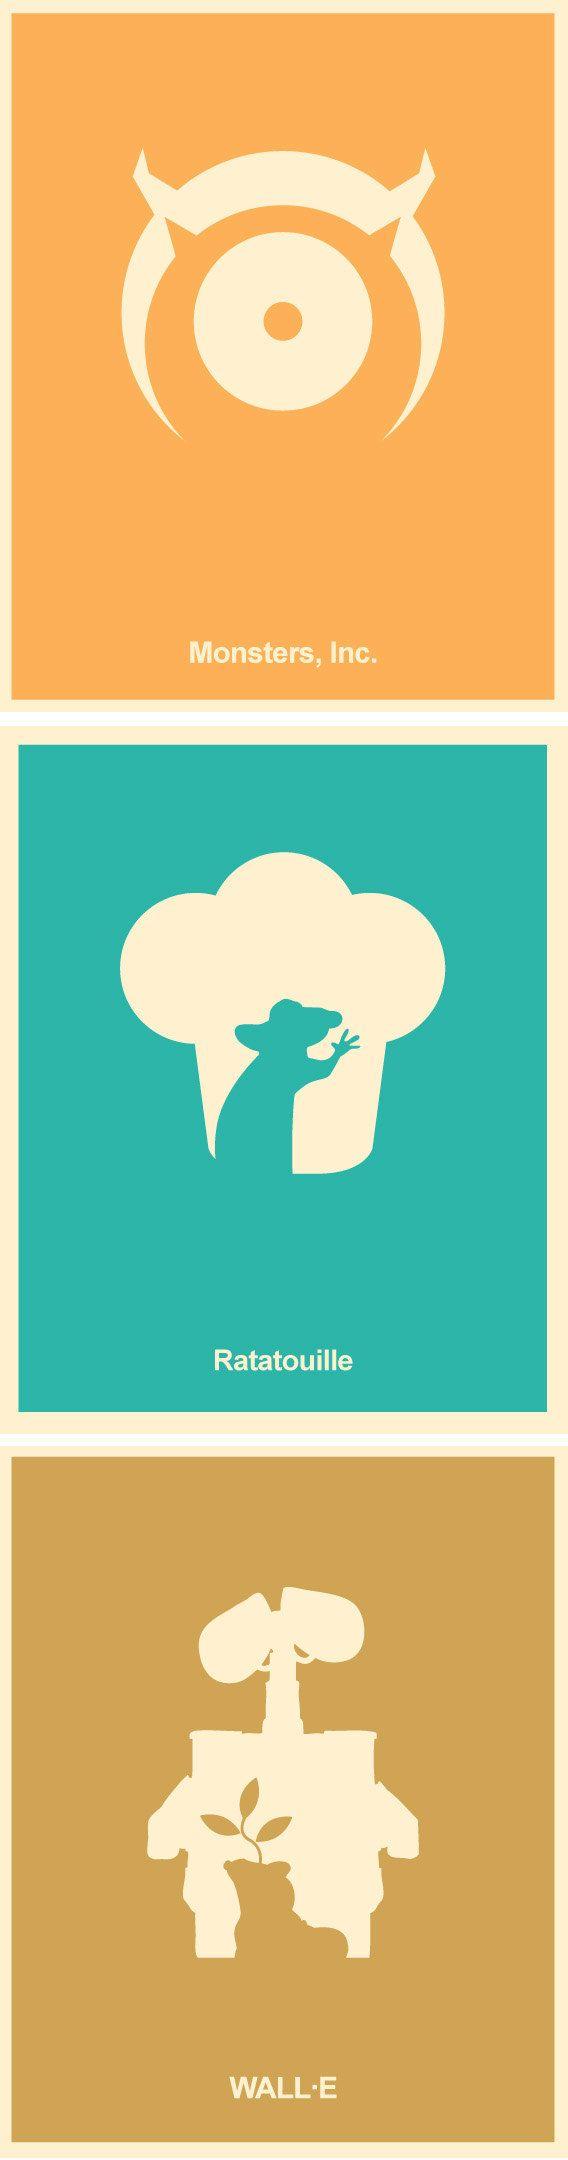 Impostare minimalista Pixar Poster Monsters Inc di Posterinspired